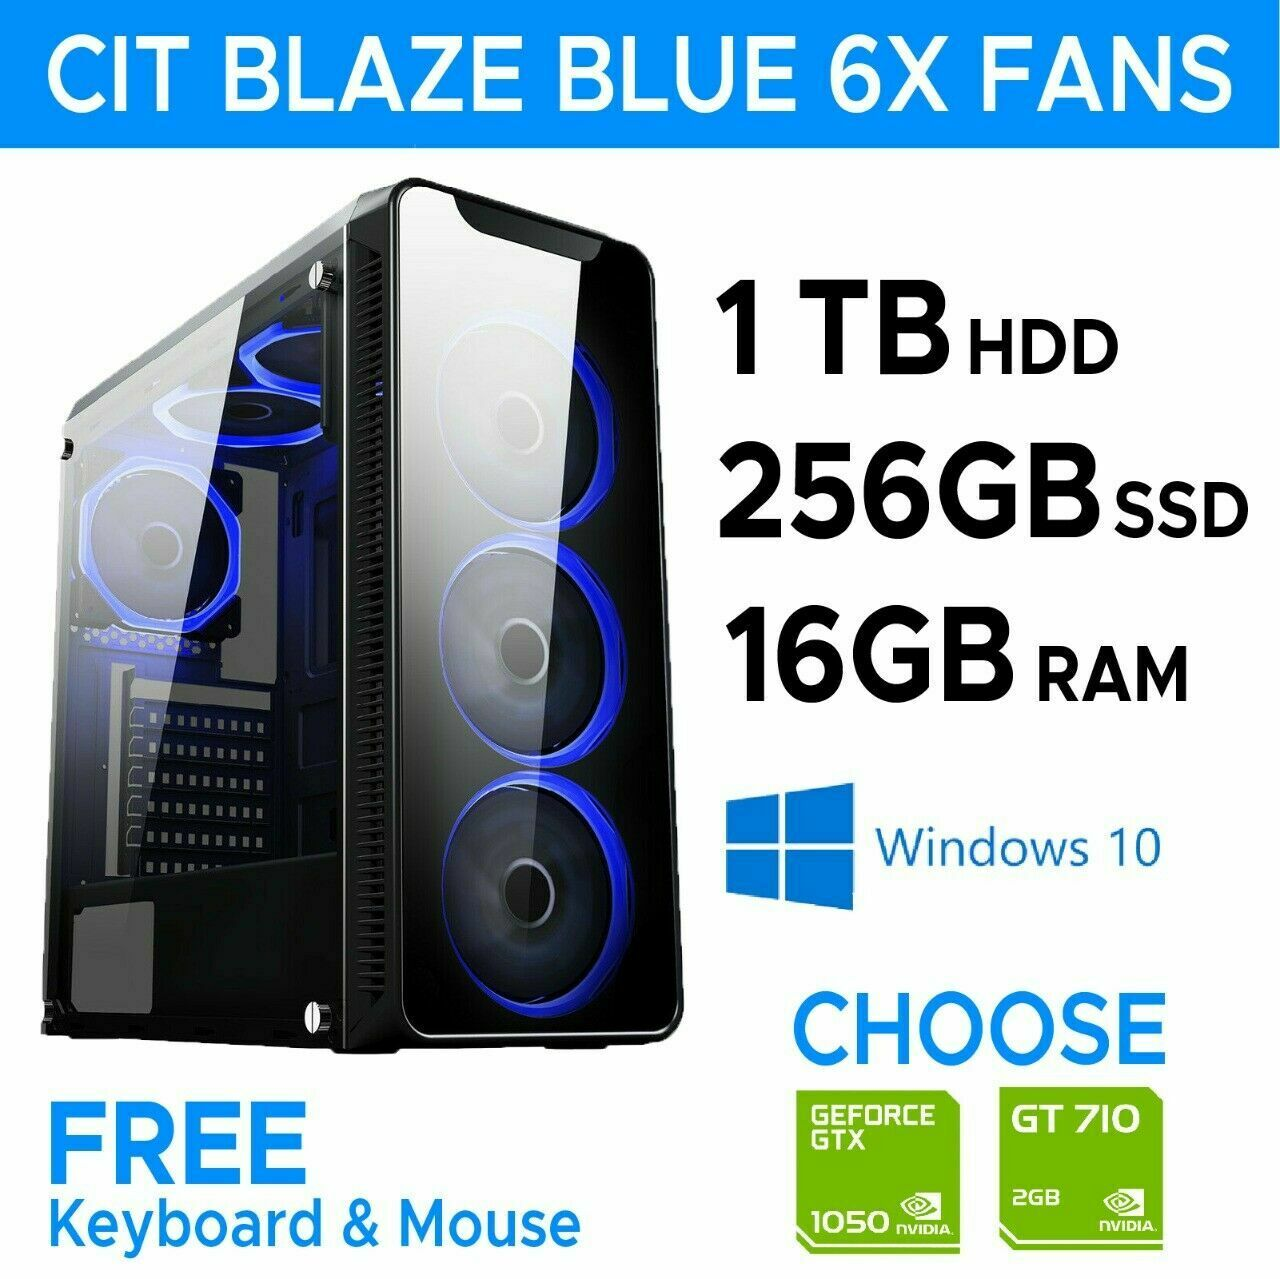 Computer Games - ULTRA FAST Gaming PC Computer Intel i7 256 SSD+1TB 16GB RAM 6 Fans,GTX 1050T1 GB